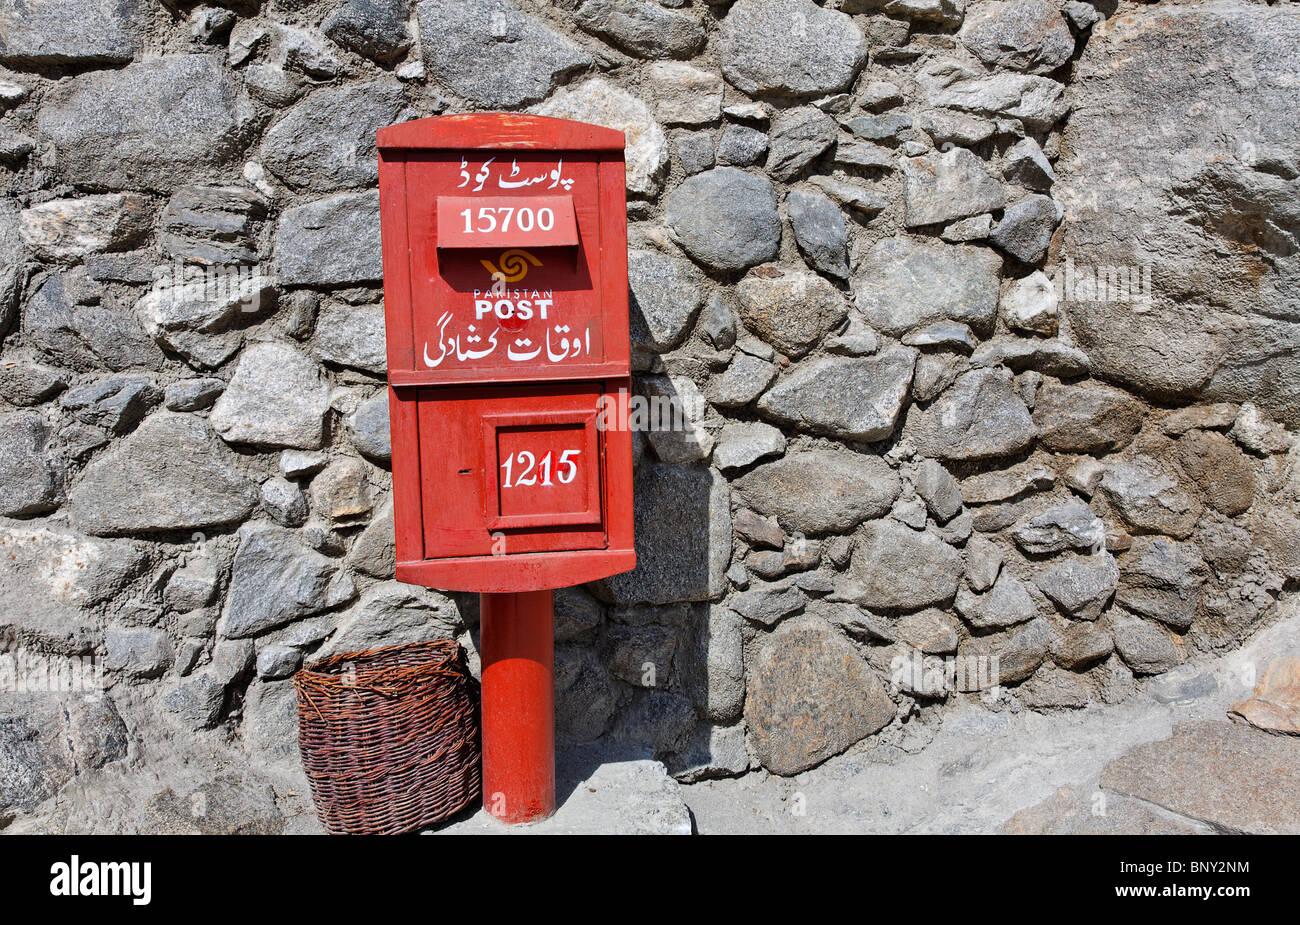 Pakistan - Hunza Valley - Karimabad - post box - Stock Image